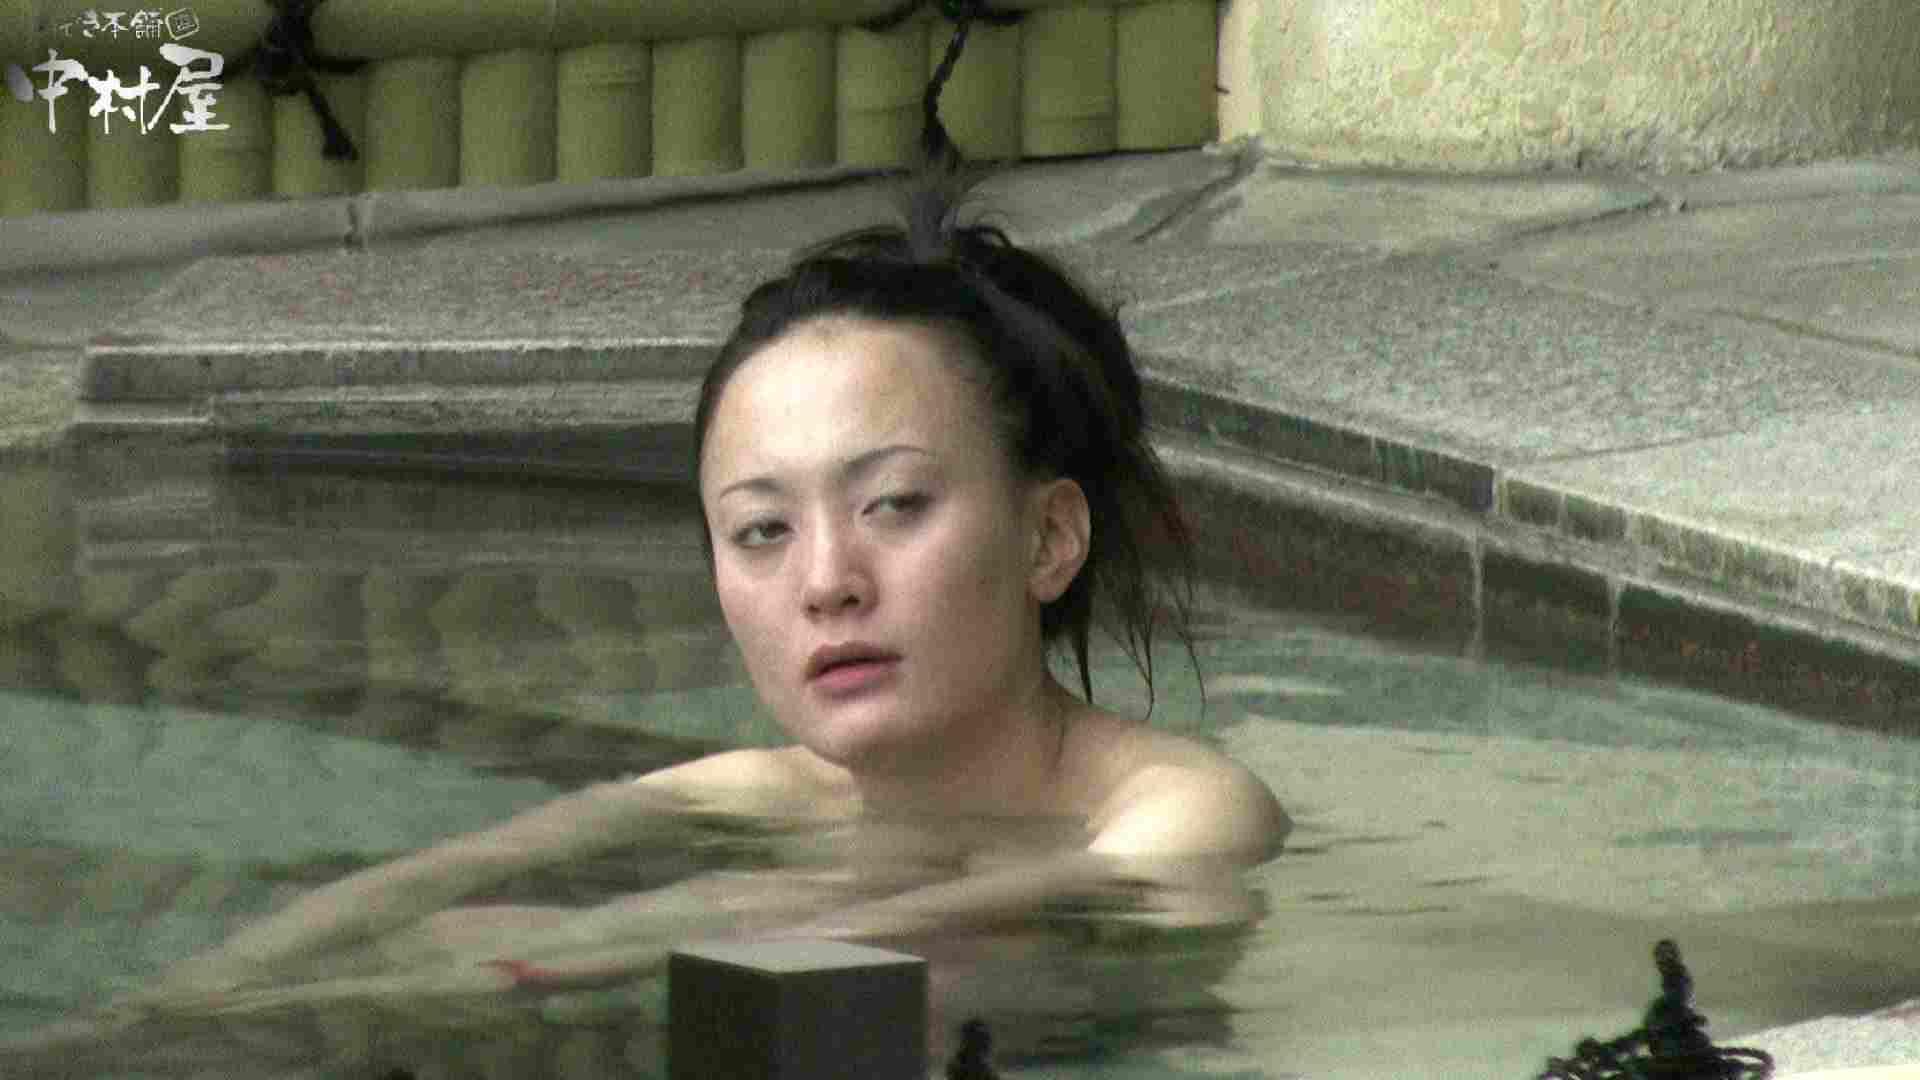 Aquaな露天風呂Vol.900 OLのエロ生活 すけべAV動画紹介 88連発 50